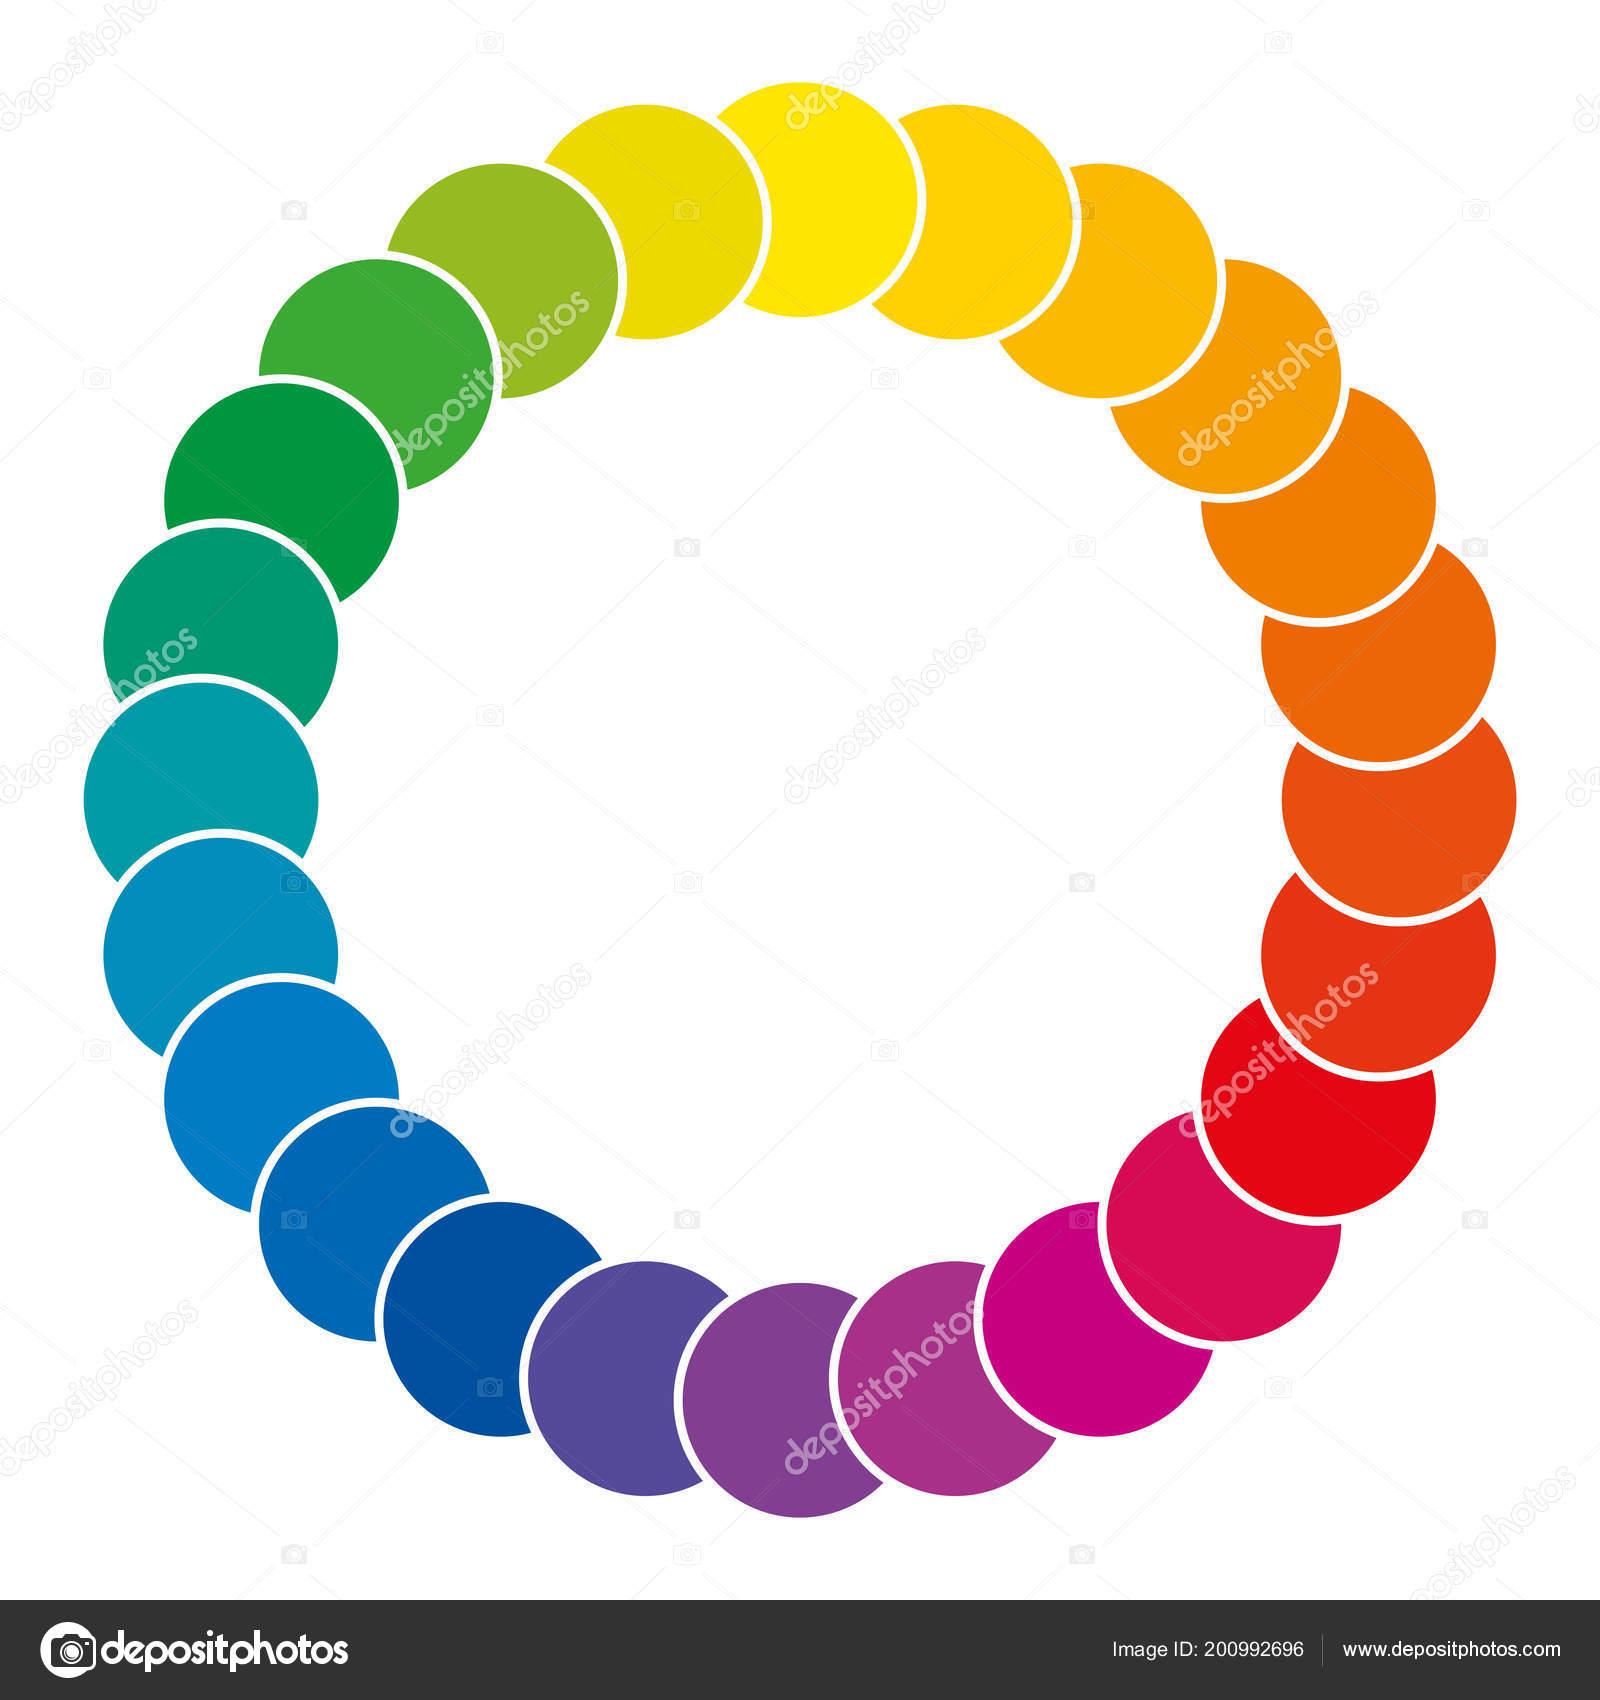 Color Wheel Made Circles Rainbow Colored Circles Showing